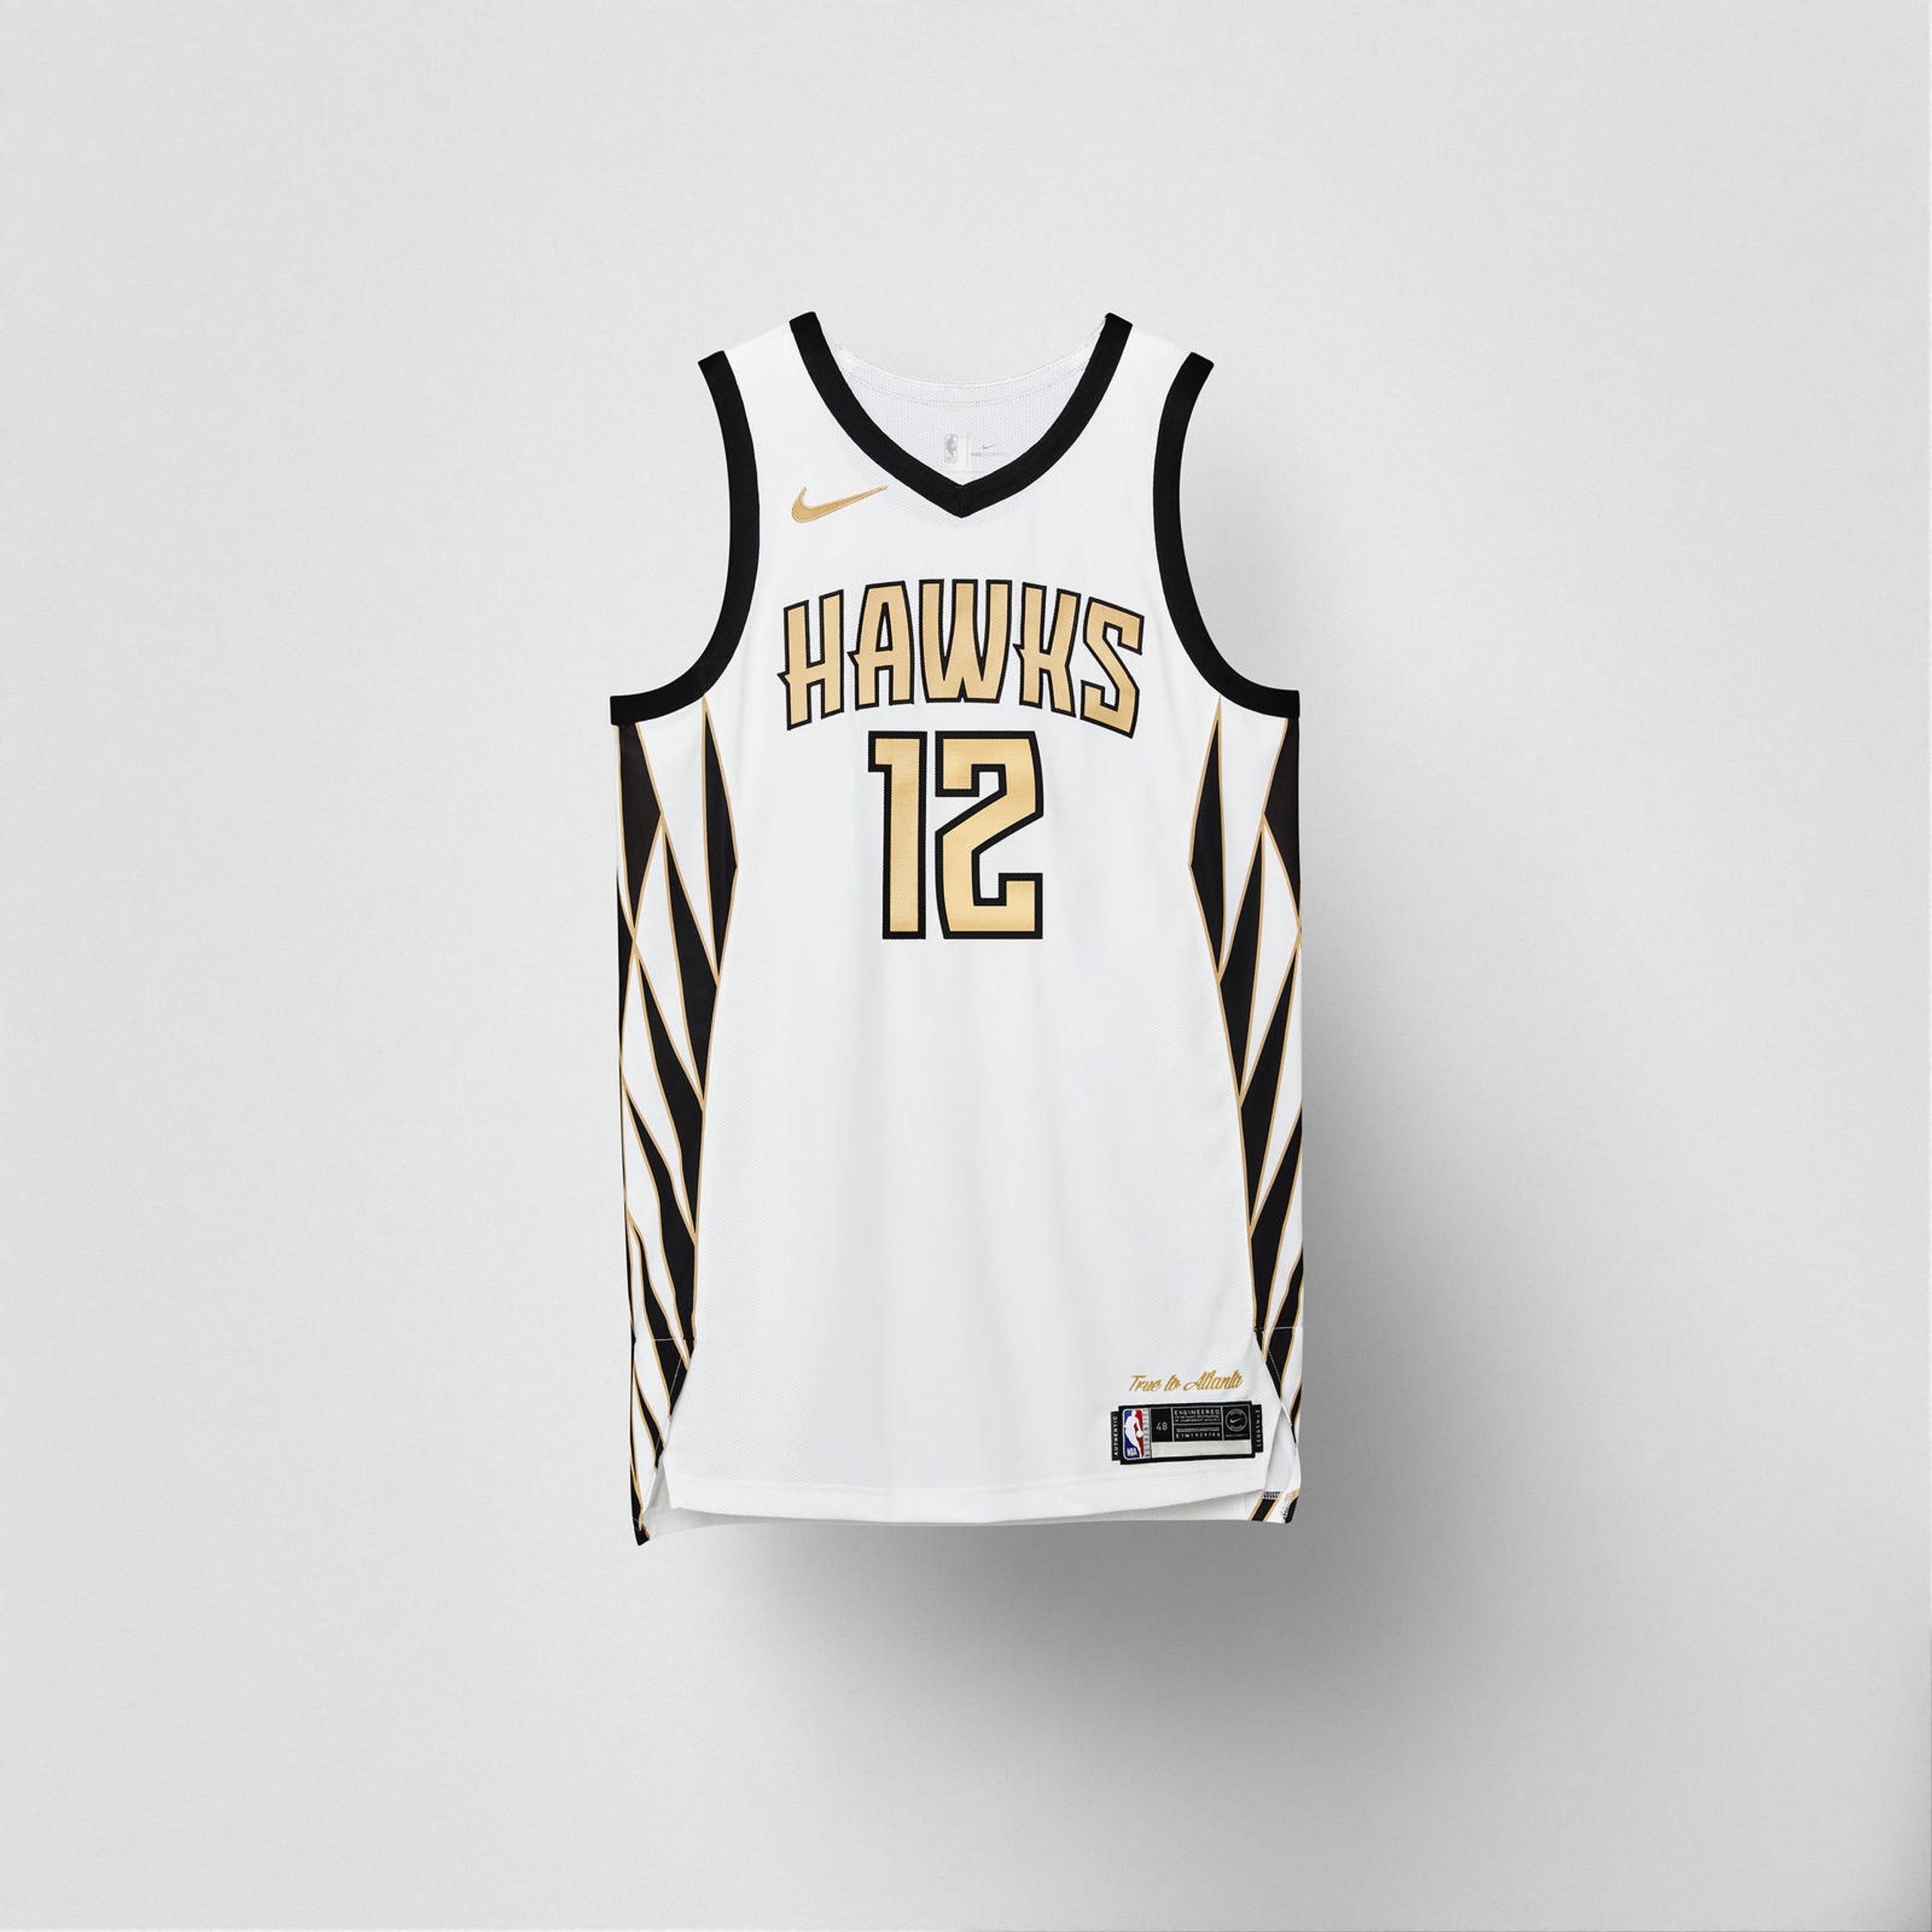 c38eac2cb12 Nike NBA City Edition uniforms for 2018-19 season